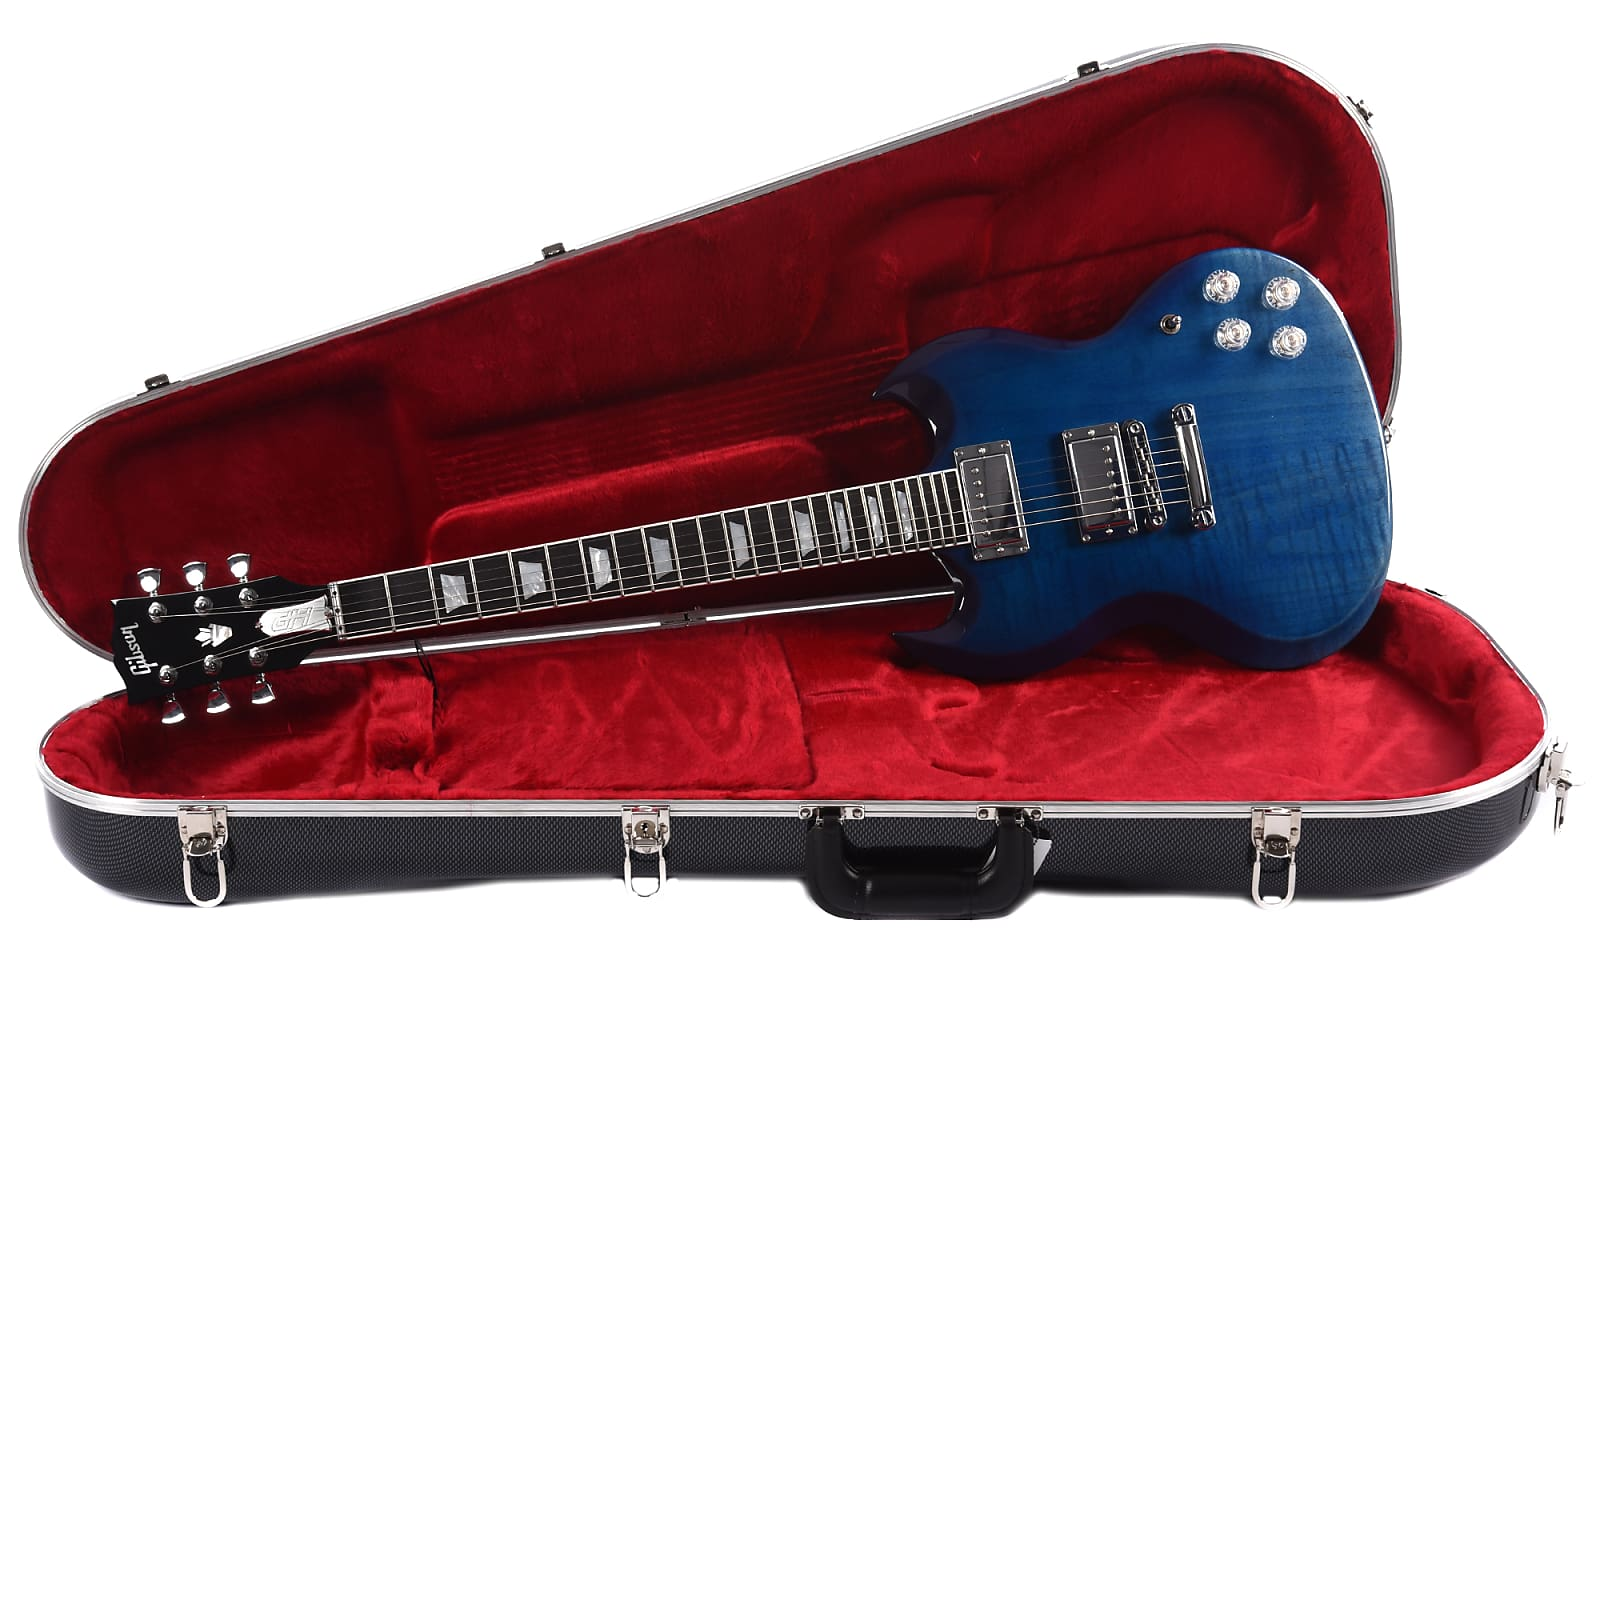 Gibson USA SG High Performance 2019 Blueberry Fade (Serial #190005141)